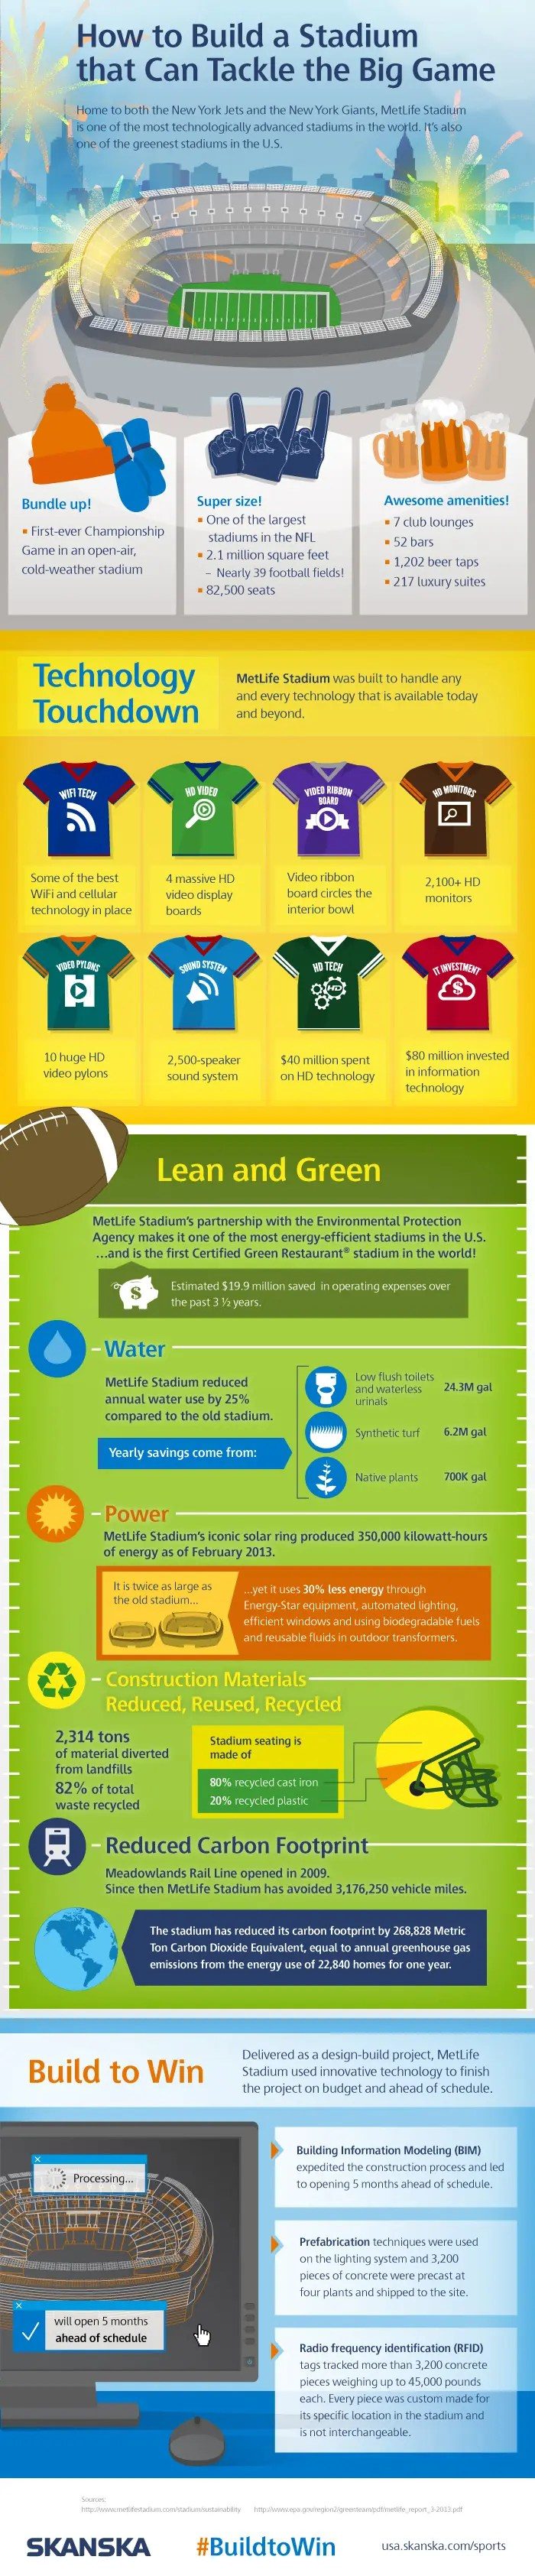 Skanska MetLife Stadium infographic